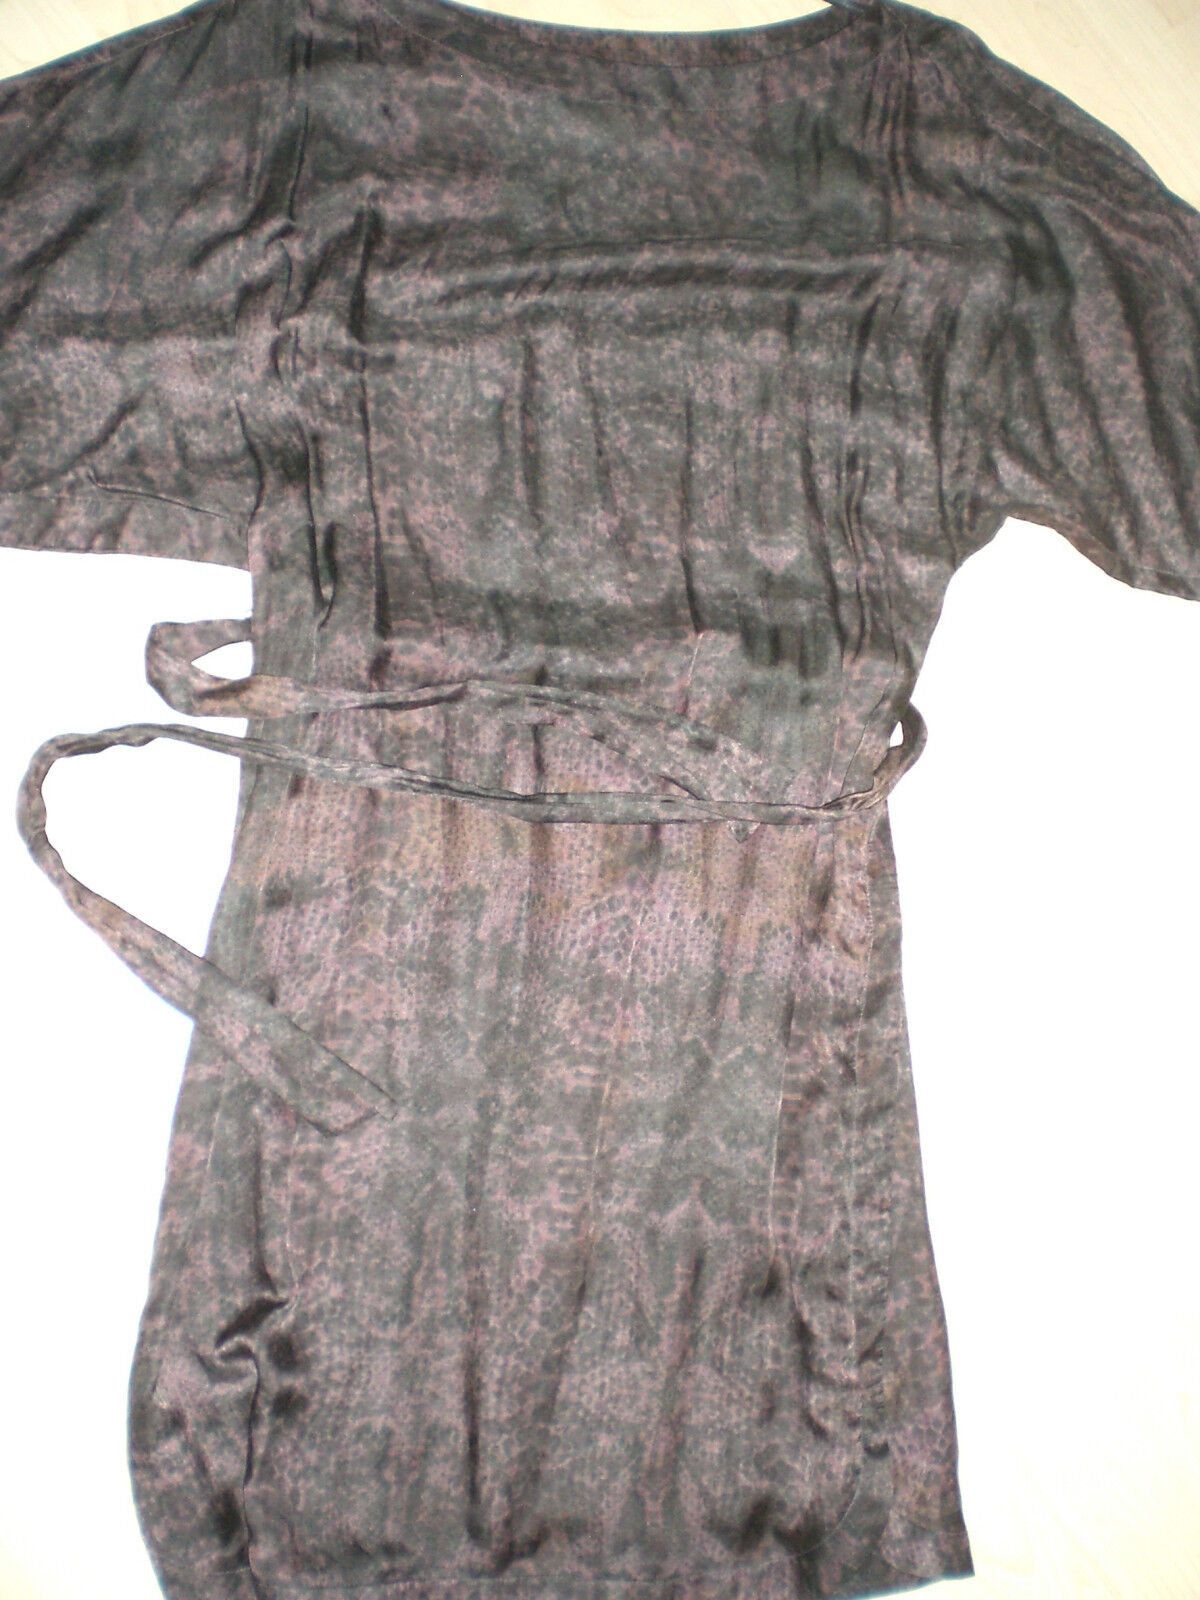 Joop Damenkleid Seide baumwolle dunkel braun schwarz Gr. 38 1 4 Arm Gürtel